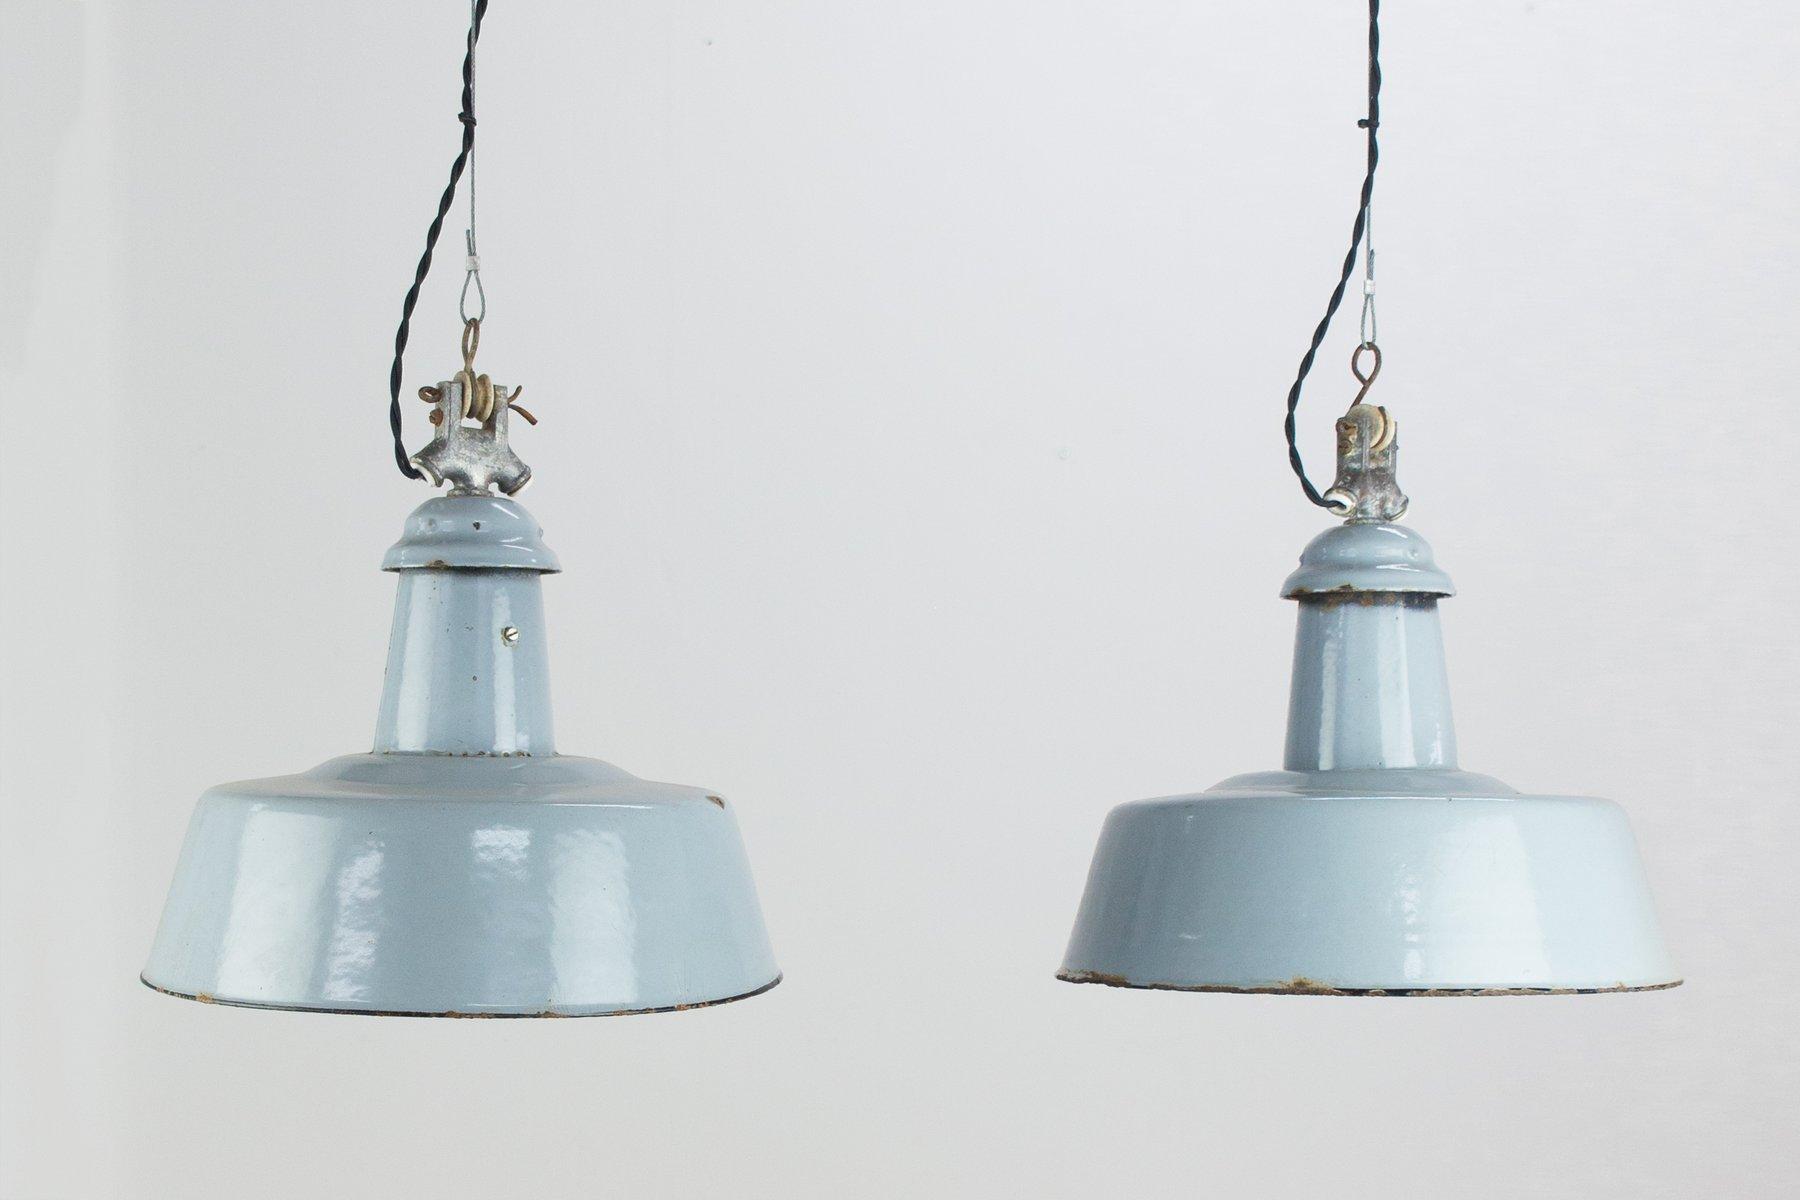 Lampade A Sospensione Vintage : Lampade a sospensione industriali vintage blu set di 2 in vendita